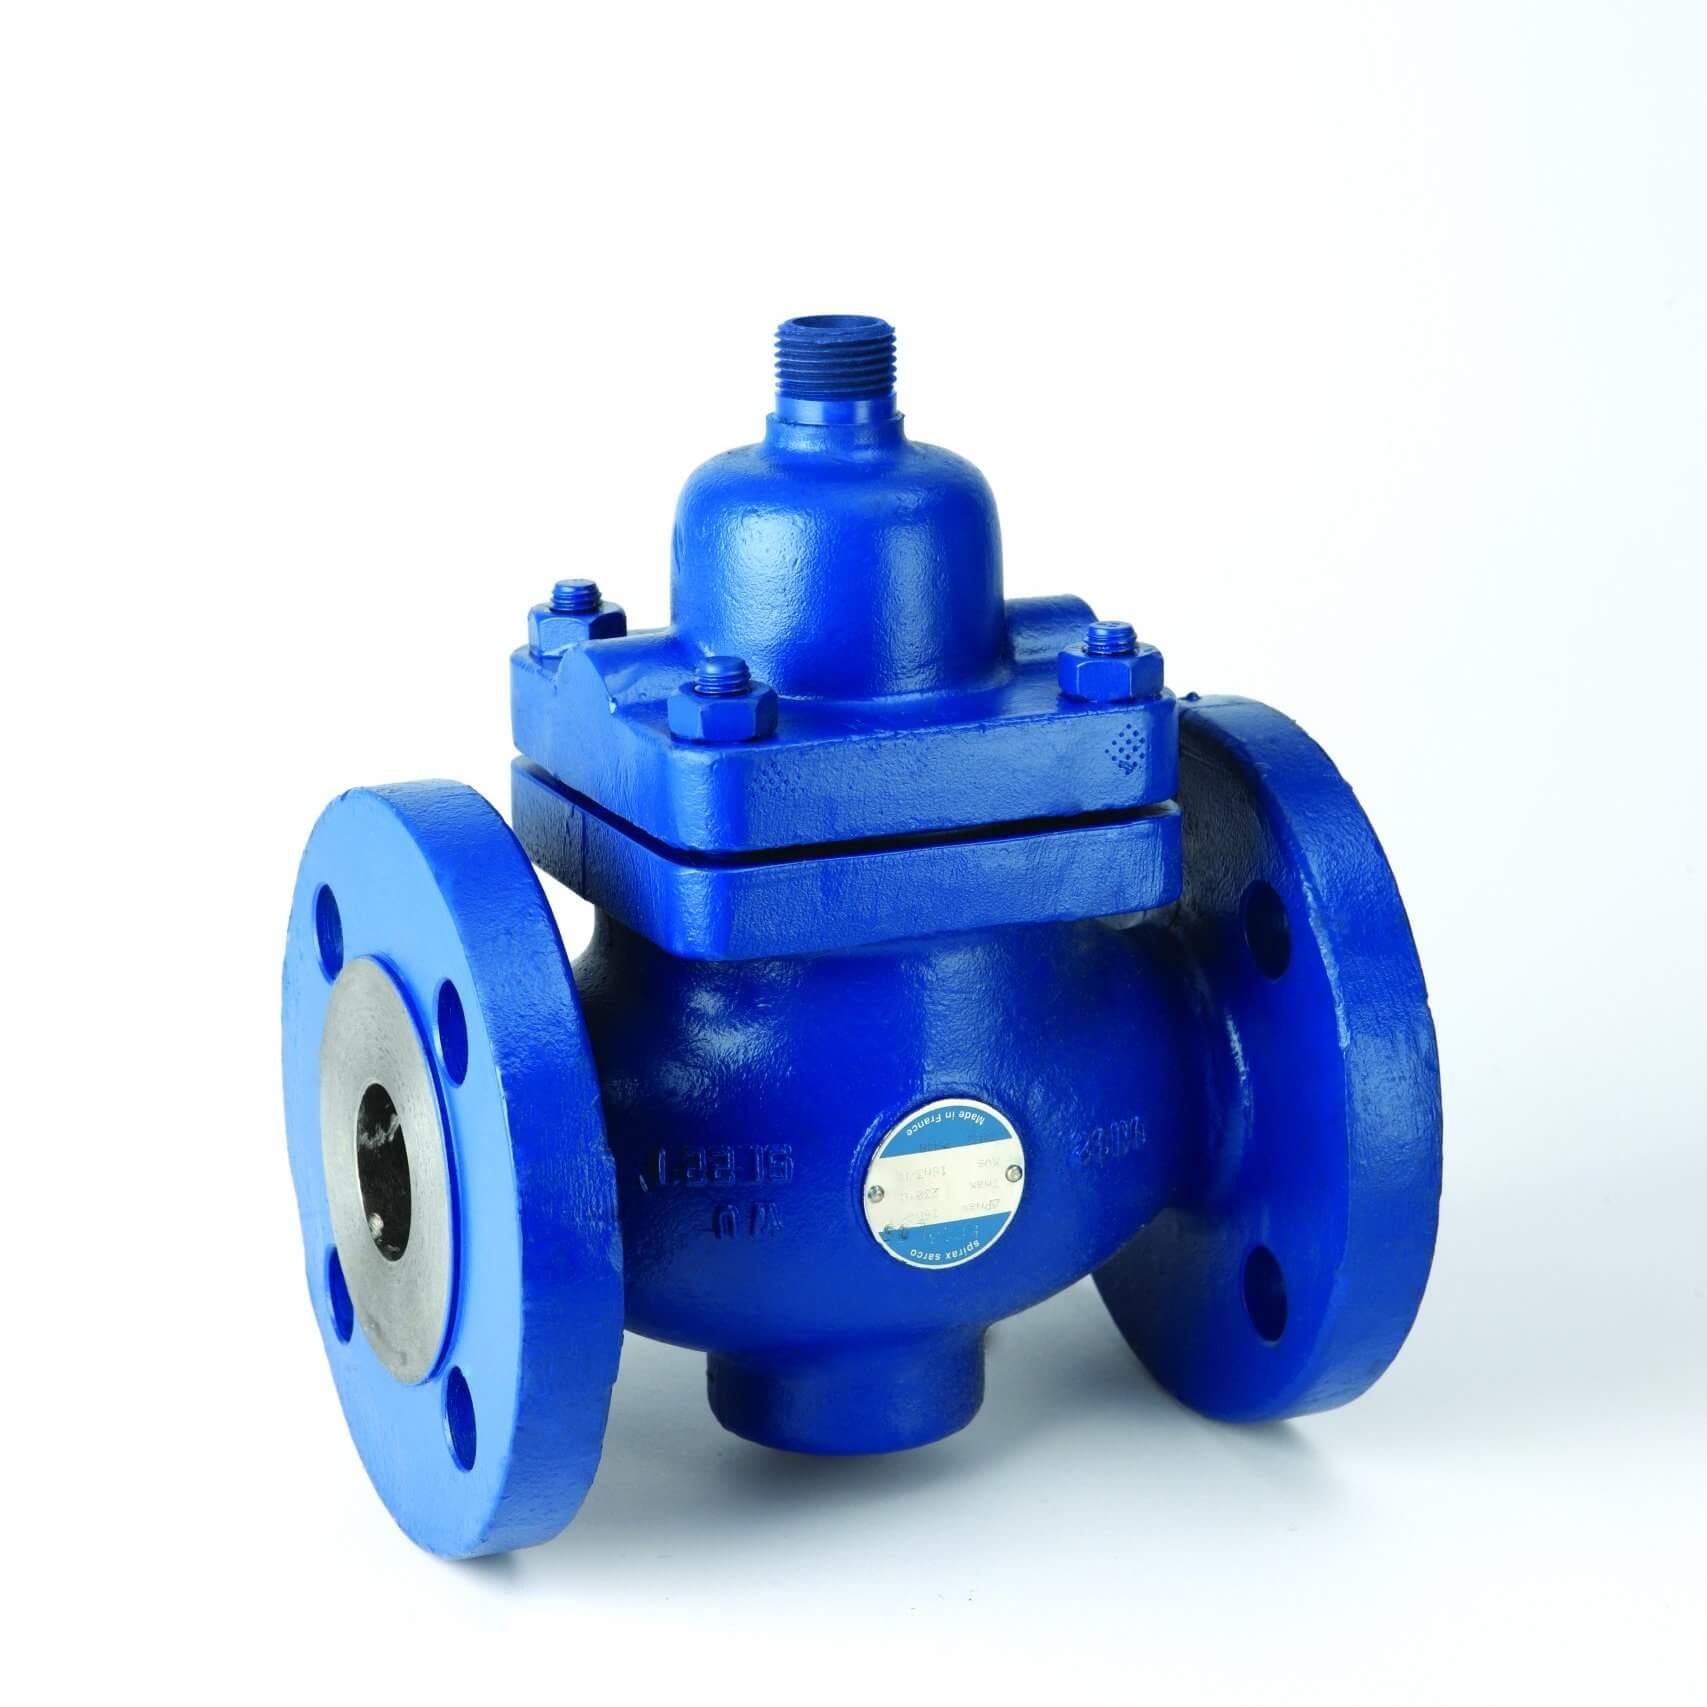 Self-acting temperature control valve with 2-port valves